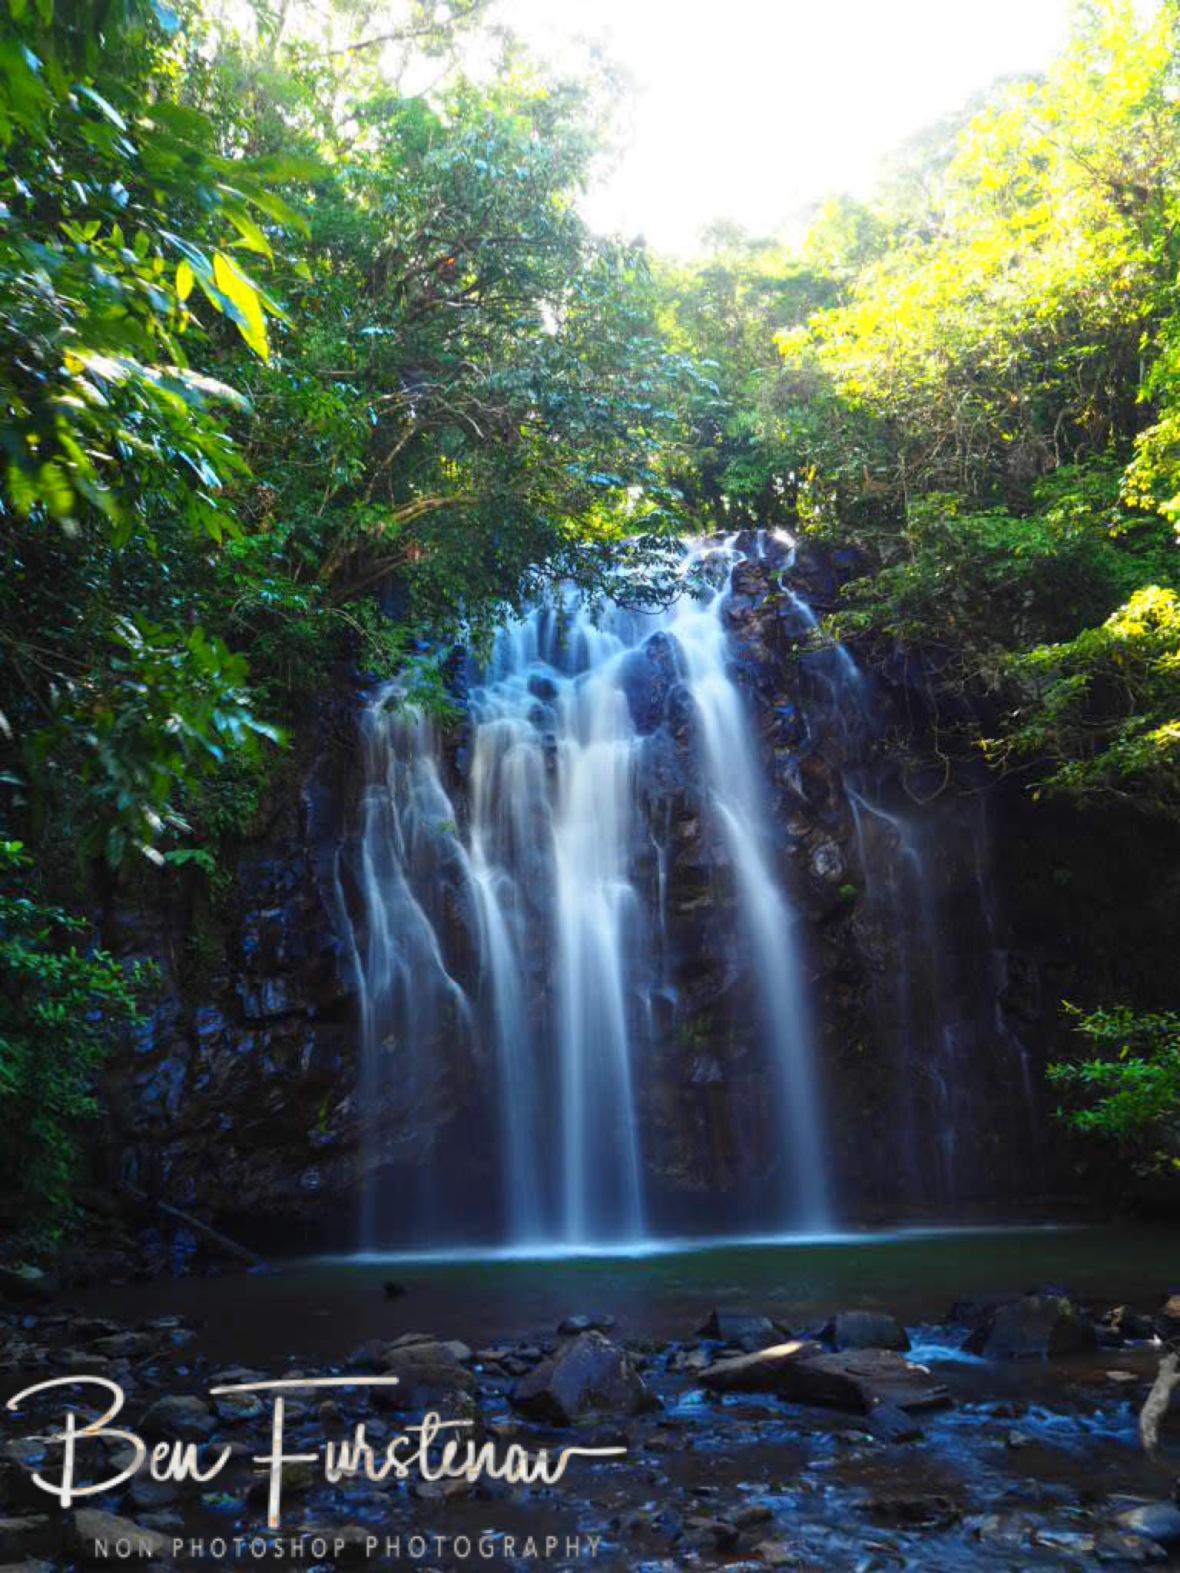 Ellinjia Falls and lush vegetation, Atherton Tablelands, Far North Queensland, Australia